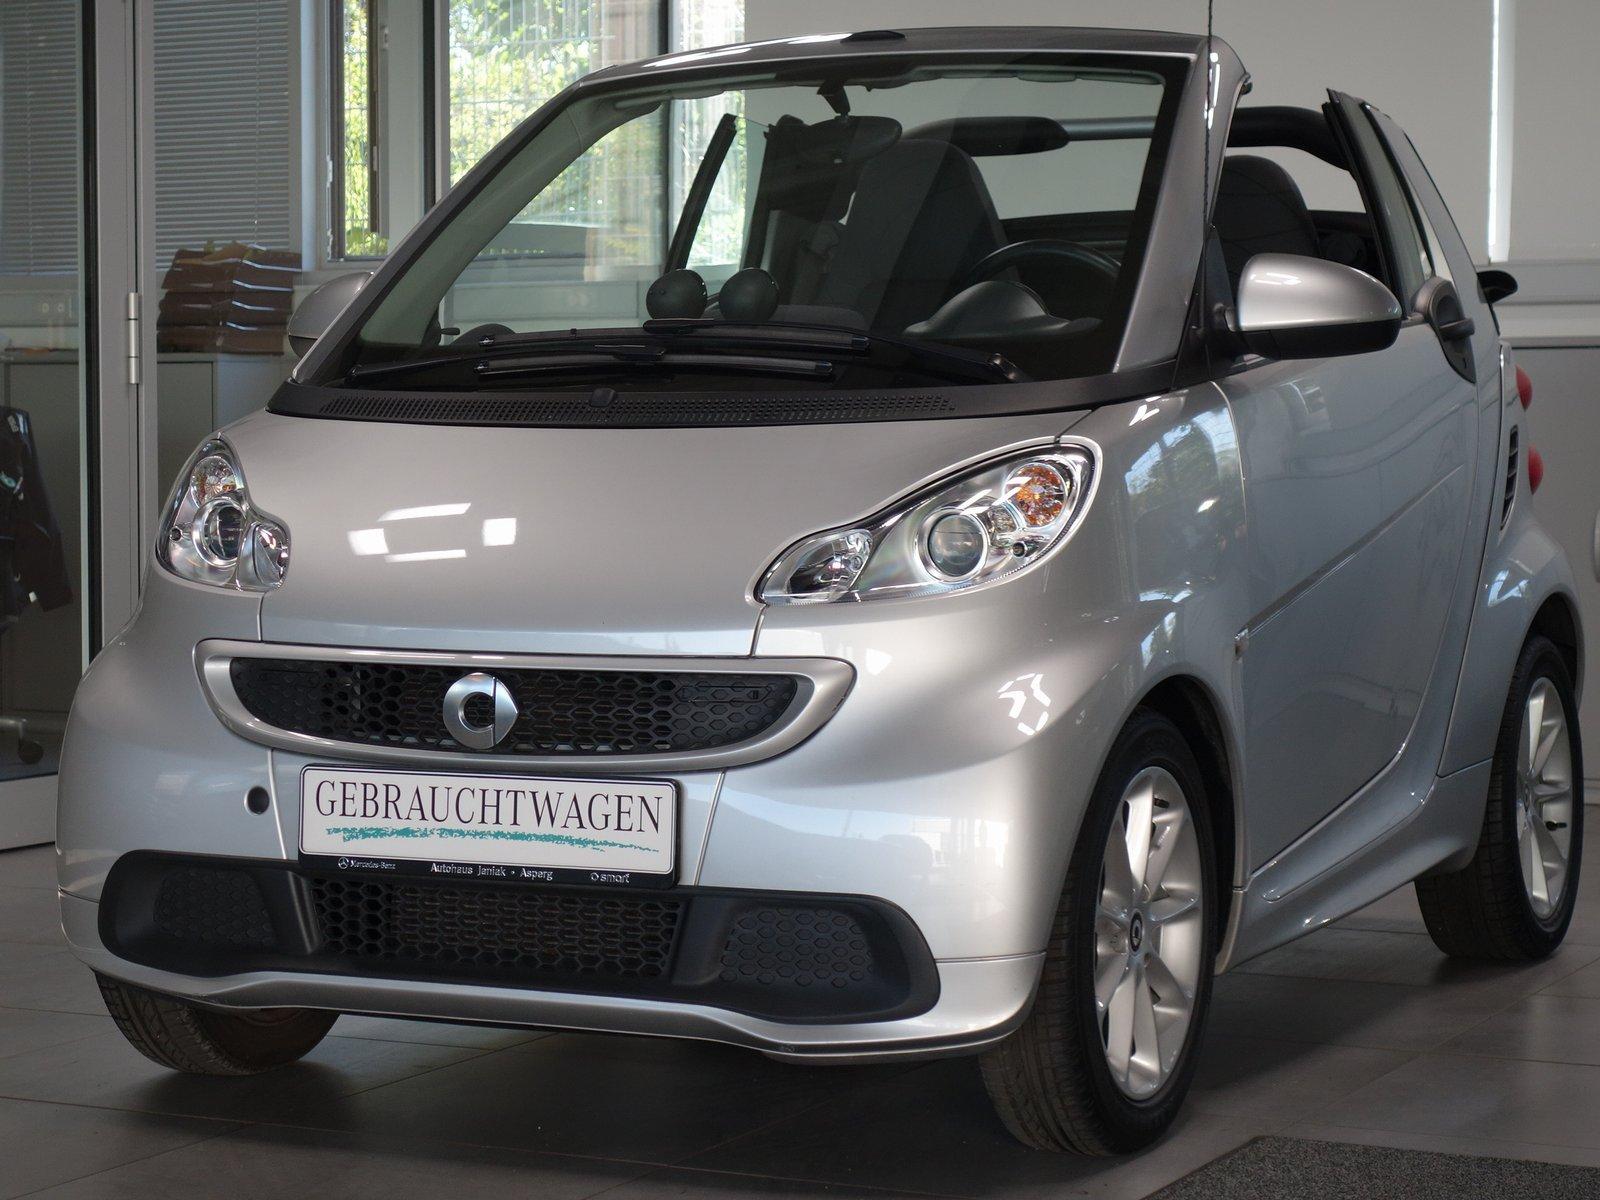 smart fortwo cabrio mhd Passion|Servo|Klima|Sitzh., Jahr 2014, Benzin